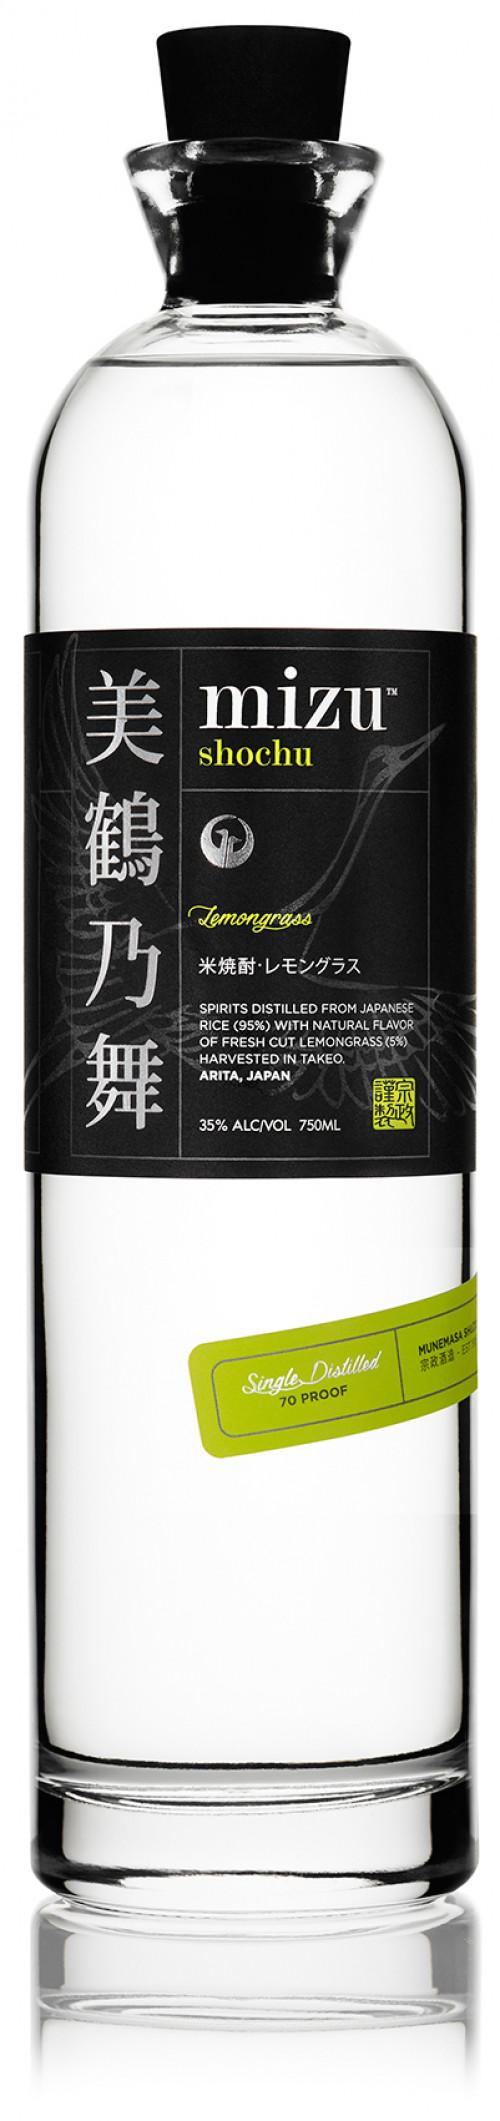 Mizu Shochu Lemongrass 750Ml